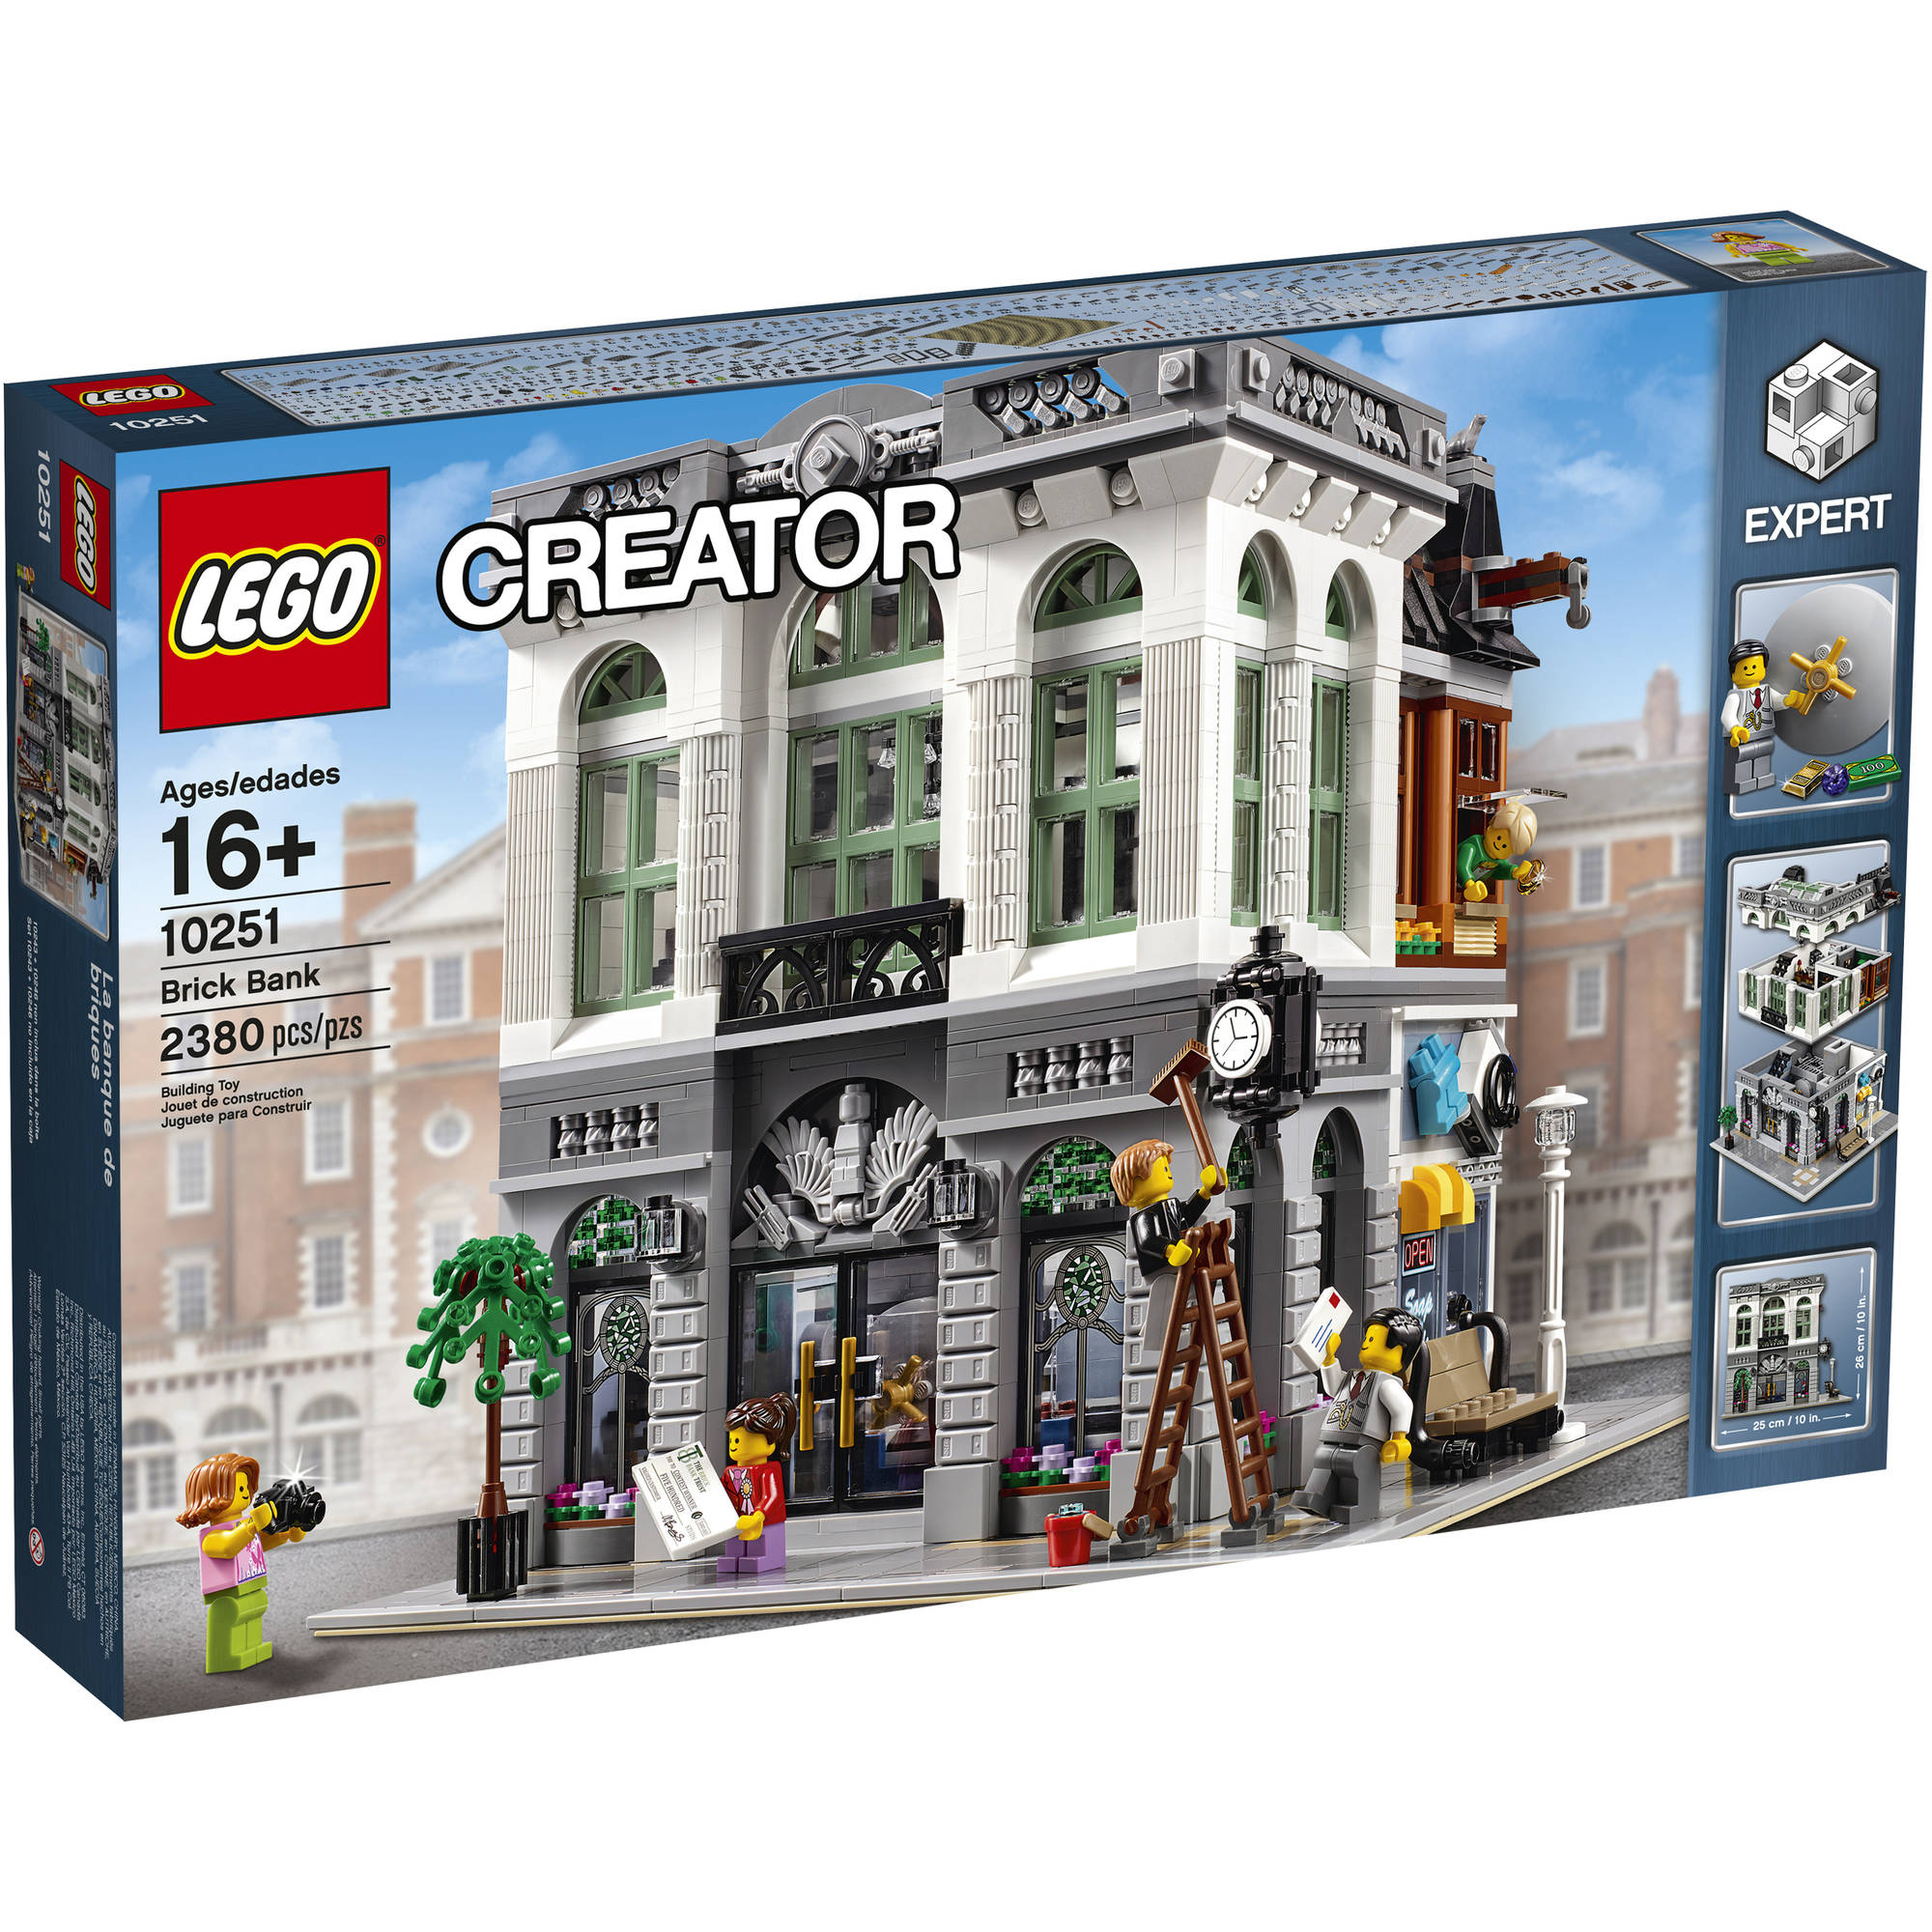 Lego Creator Expert Brick Bank 10251 by LEGO Systems, Inc.